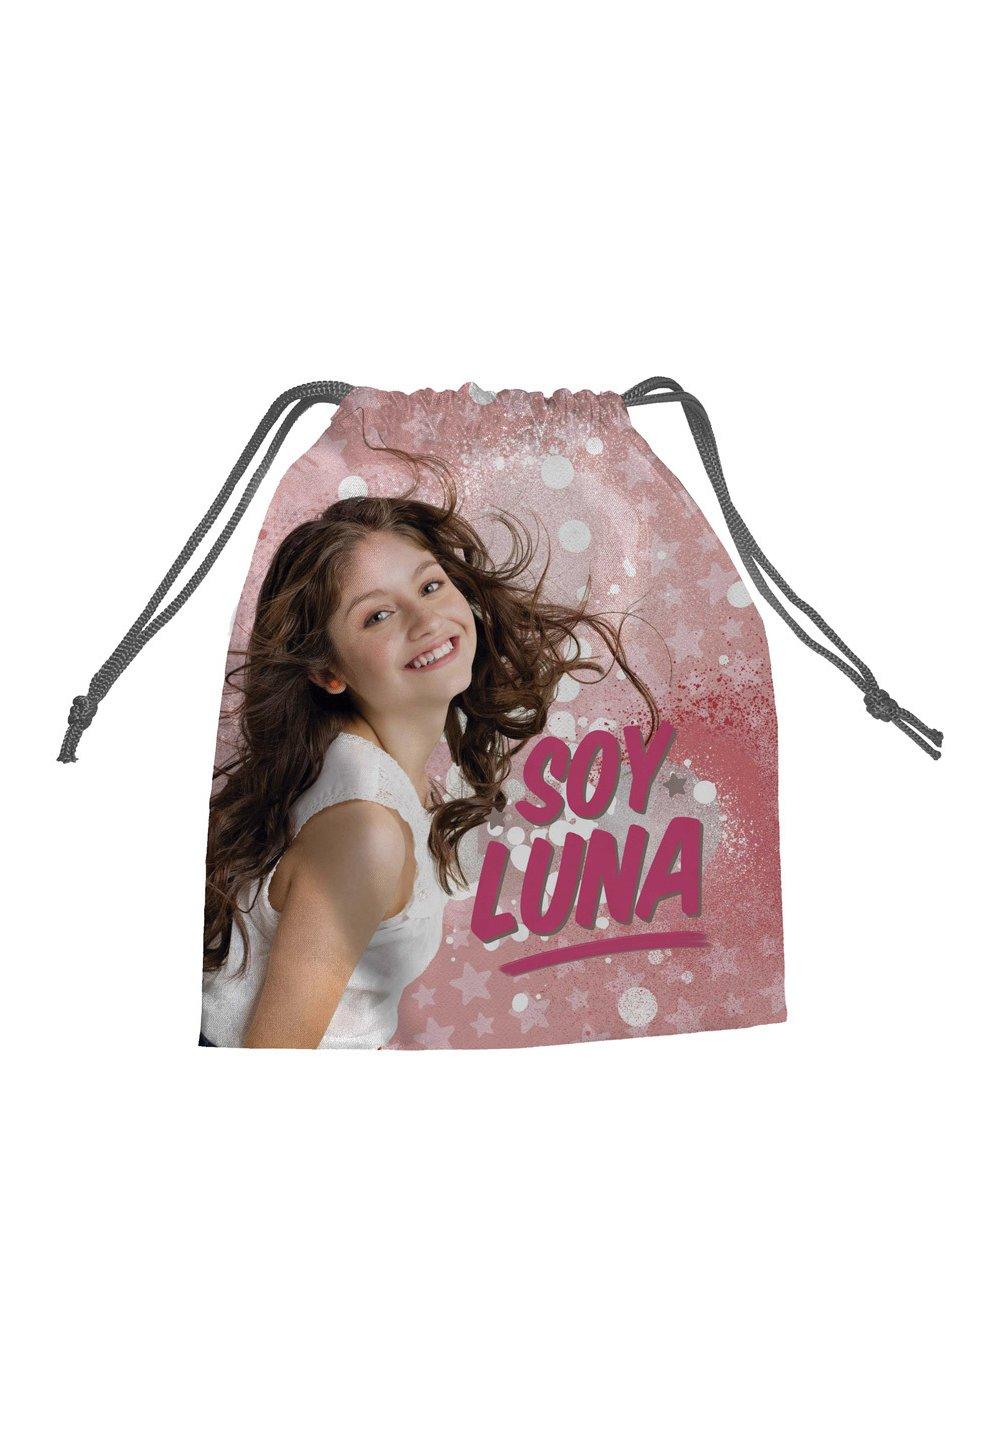 Saculet Soy Luna, roz cu stele, 27 x 22 cm imagine